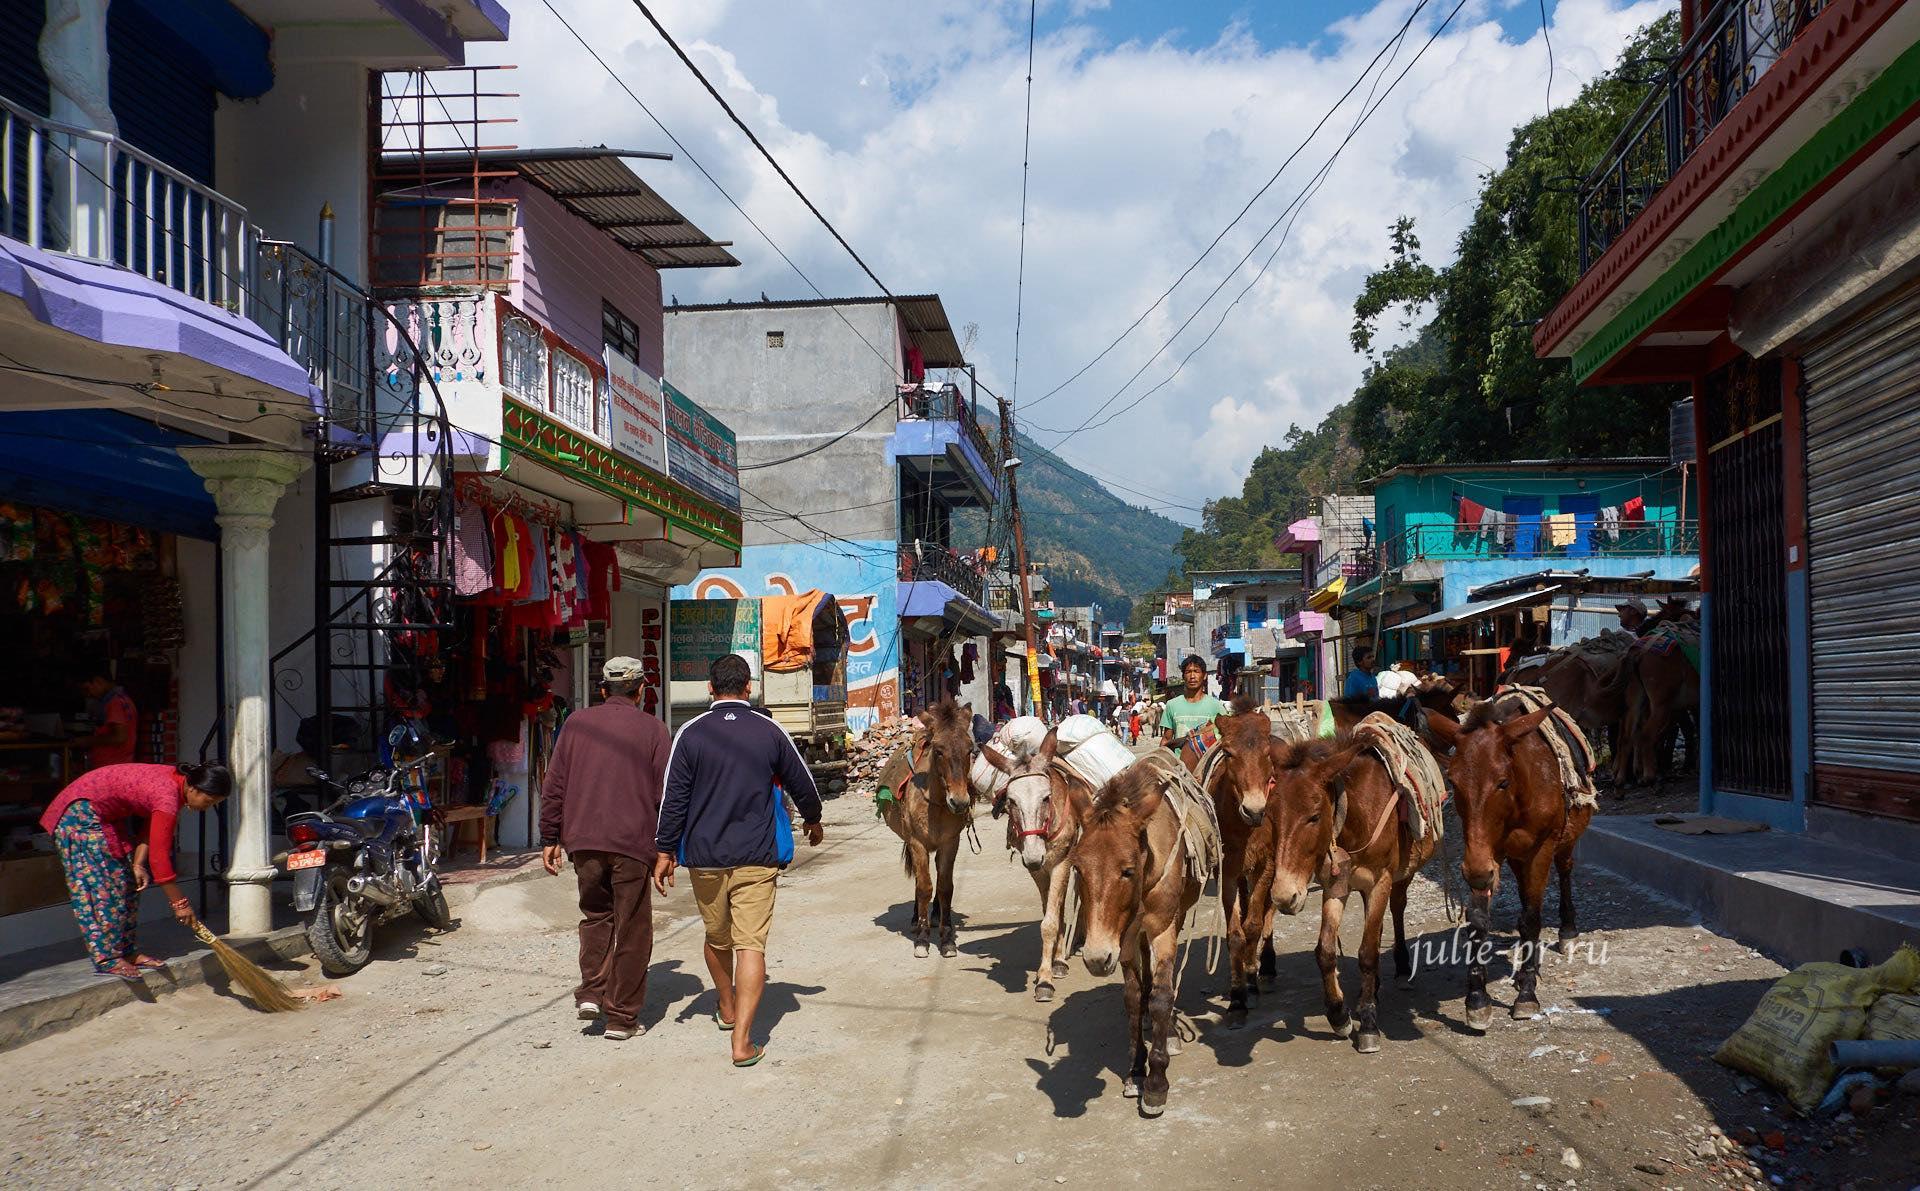 Непал, Пун-Хилл трек, Деревня Наяпул